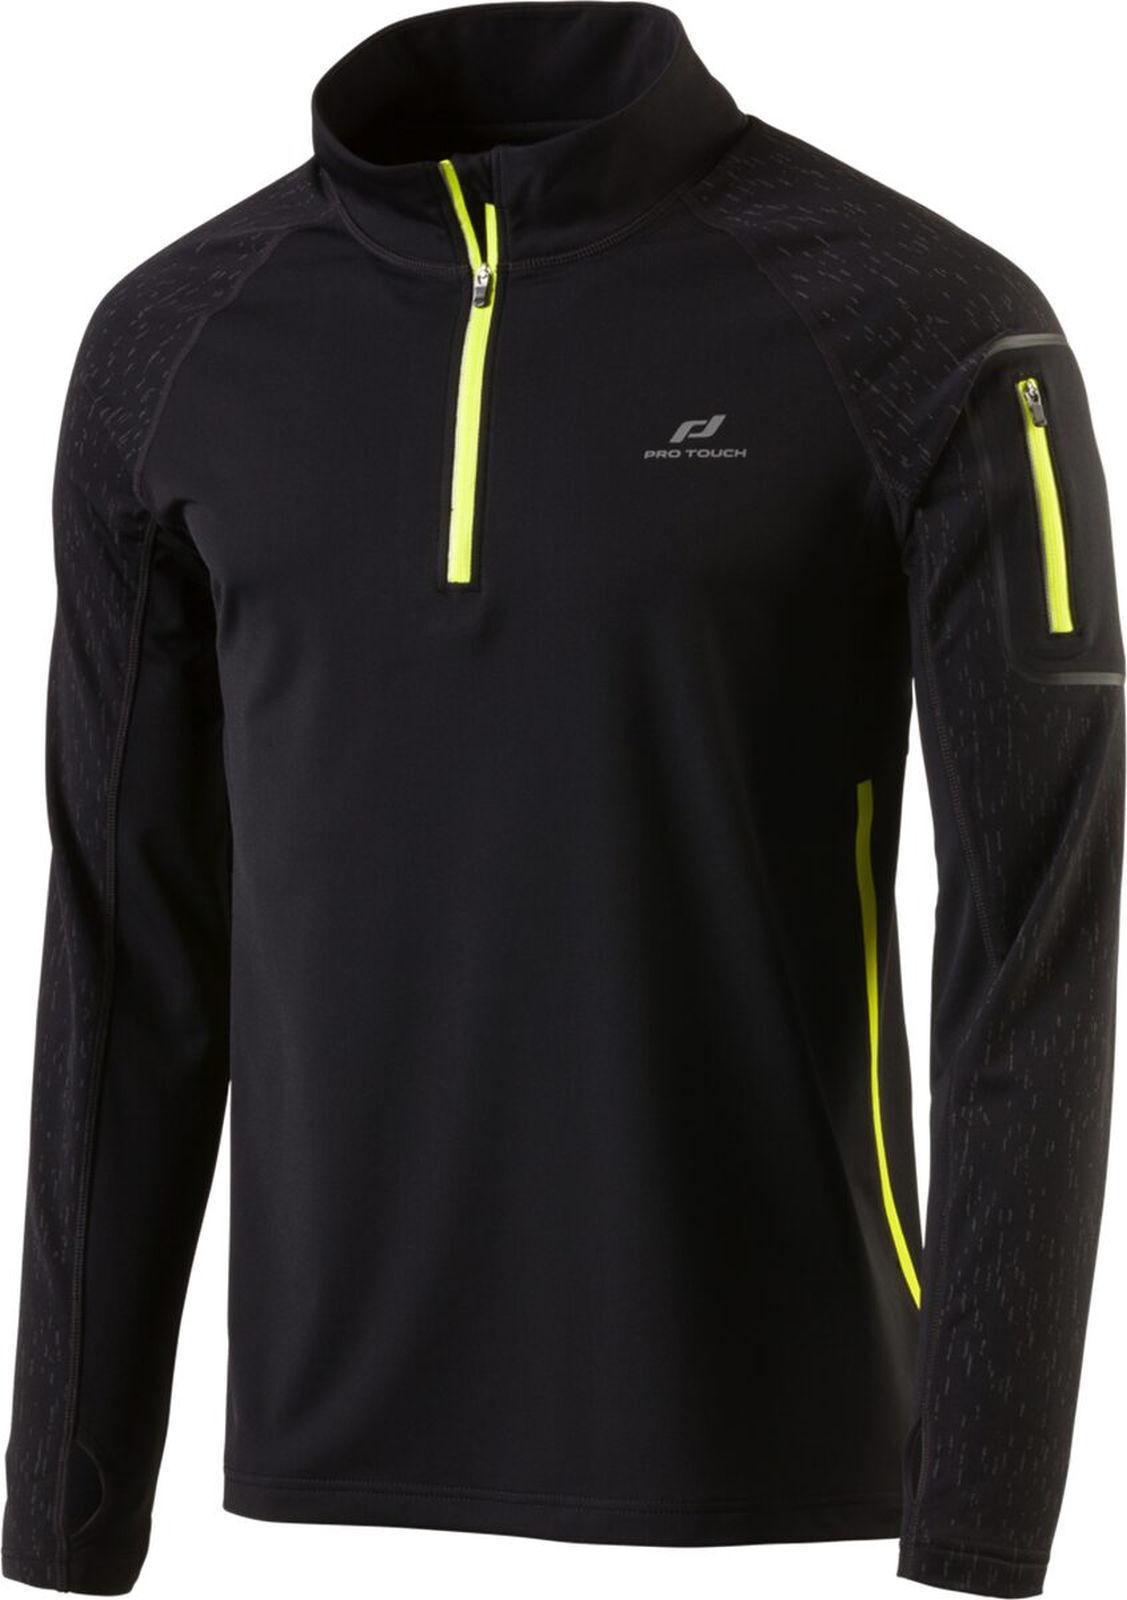 Pro Touch men Corsa Jogging Manica Lunga Pile Shirt Renzo  V black-yellow  hot sale online